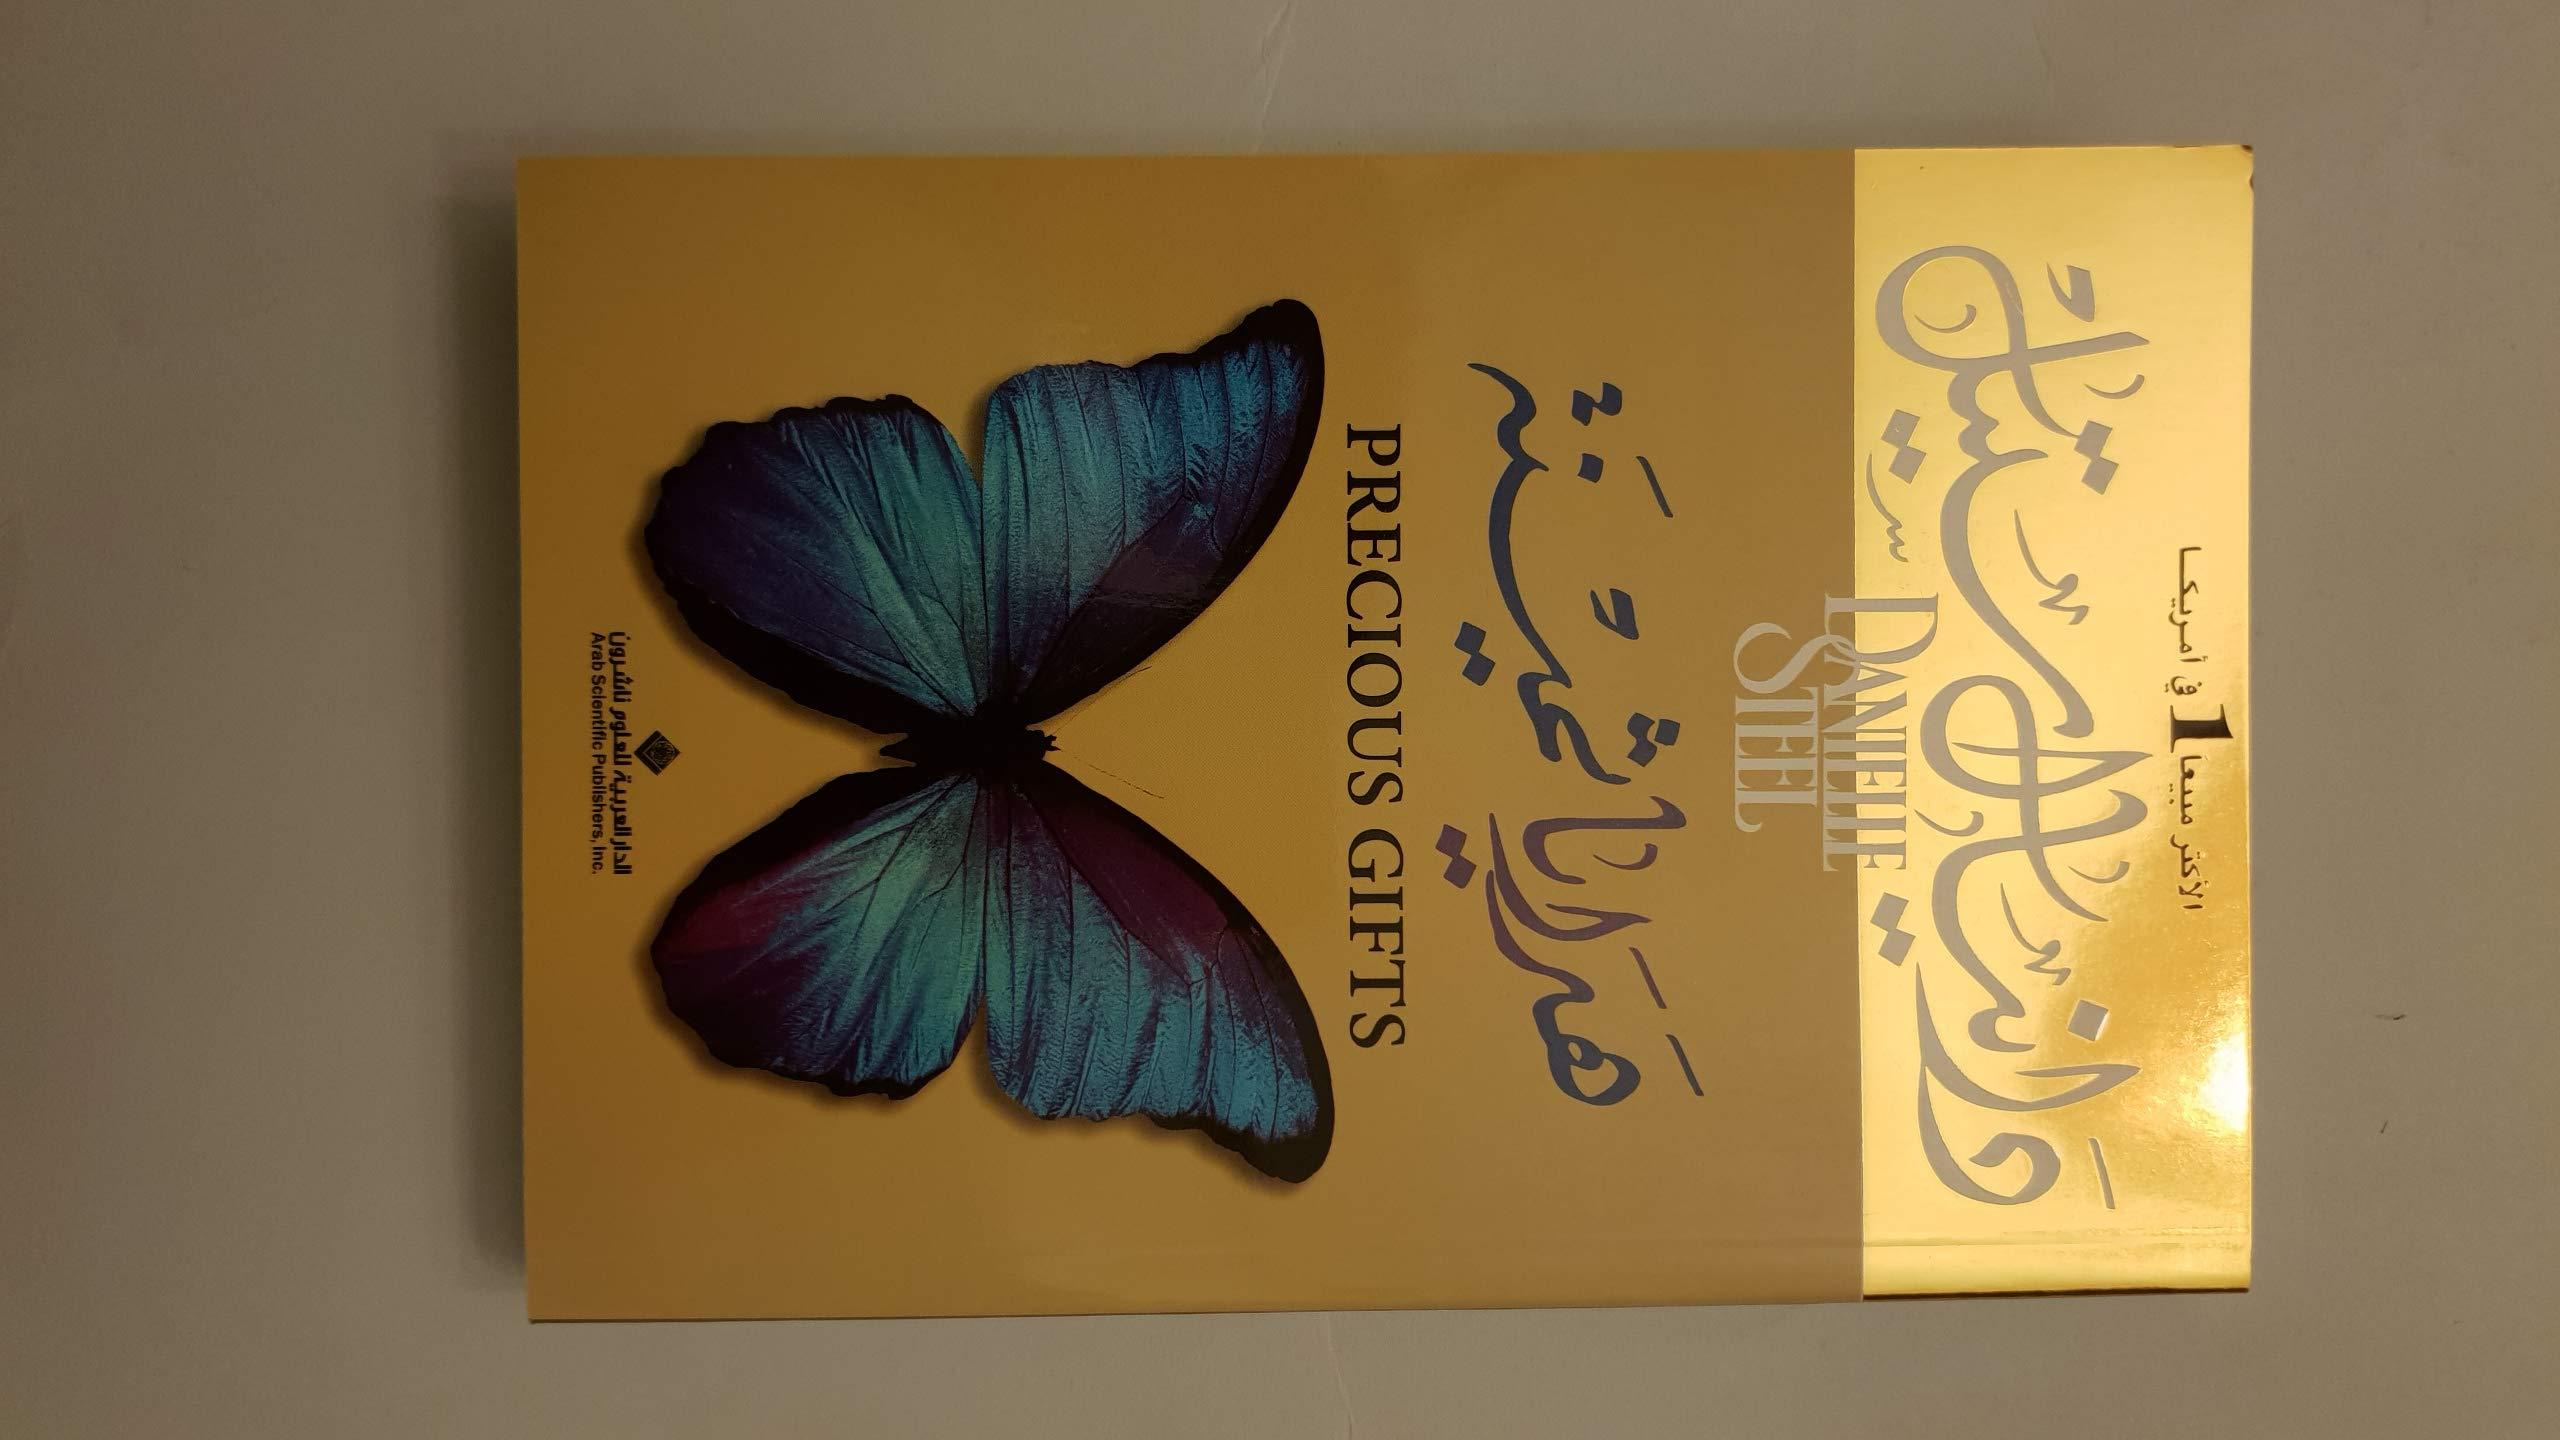 4837c8bfe هدايا ثمينة: دانيال ستيل, أفنان محمد سعد الدين: 9786140125711 ...